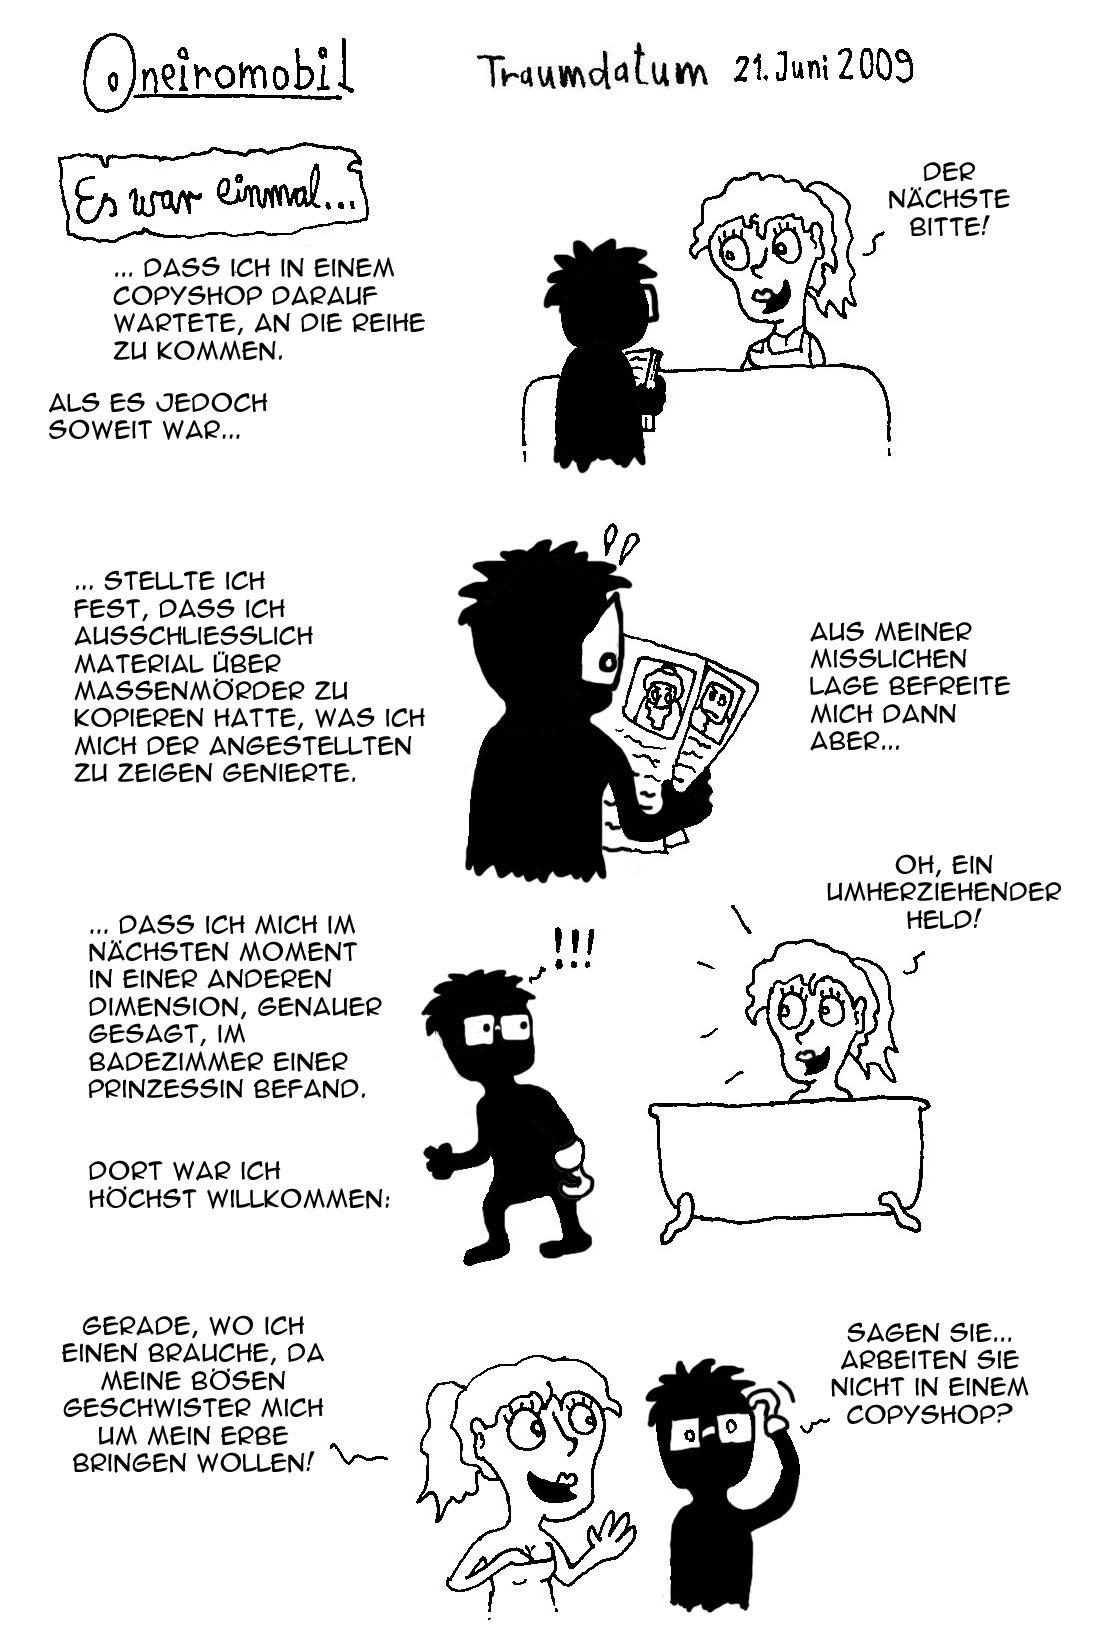 Webcomics - Oneiromobil 005a